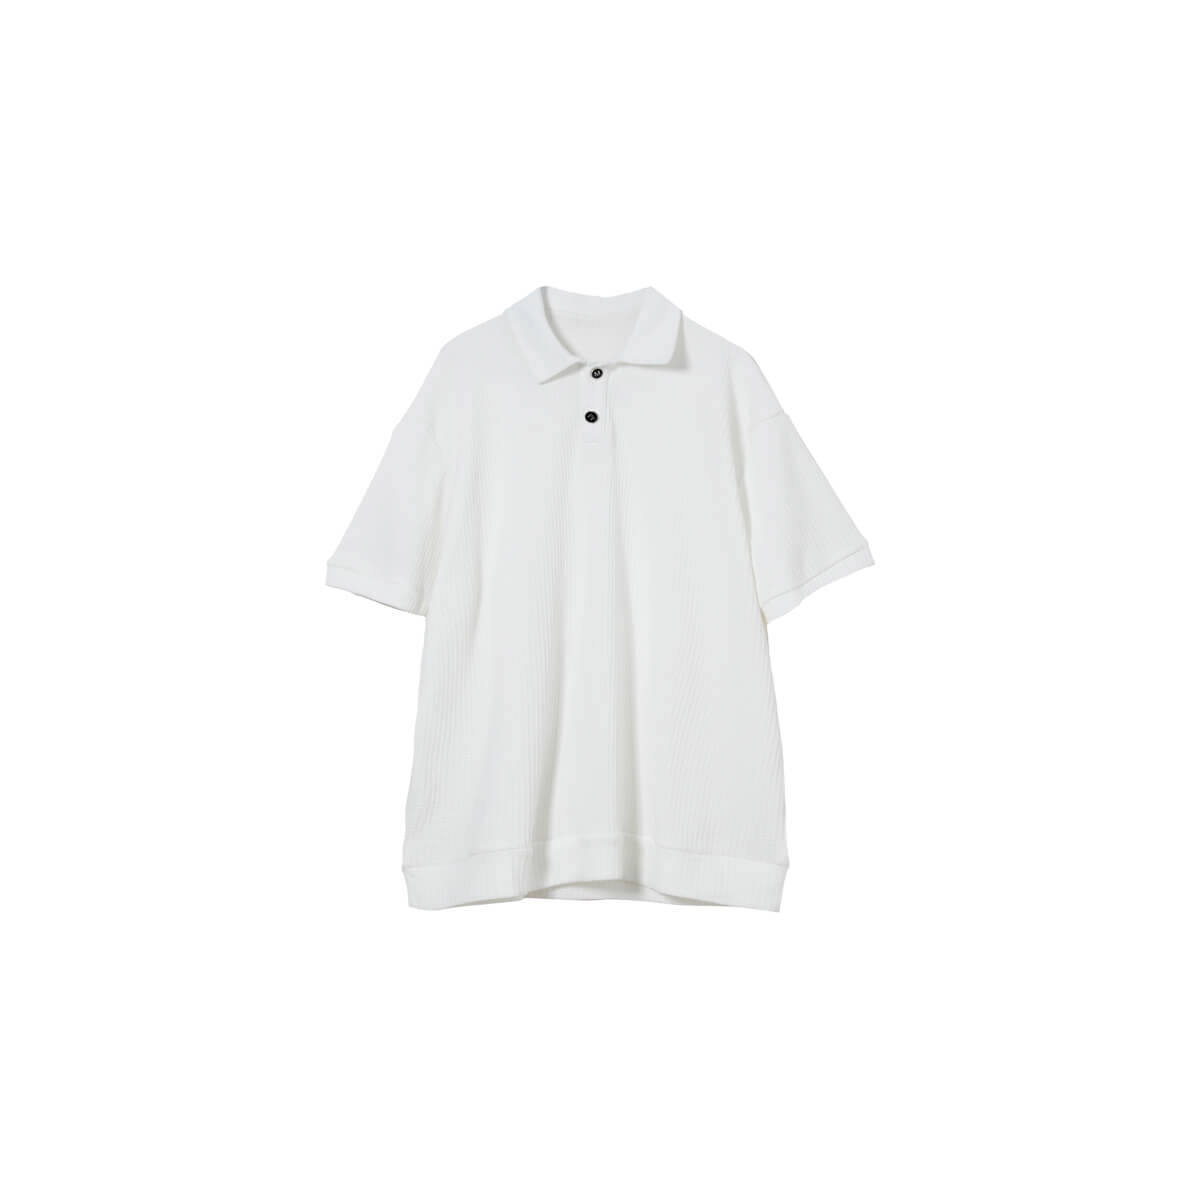 Футболка Cui Layout Studio Polo T-shirt Waffle Texture White